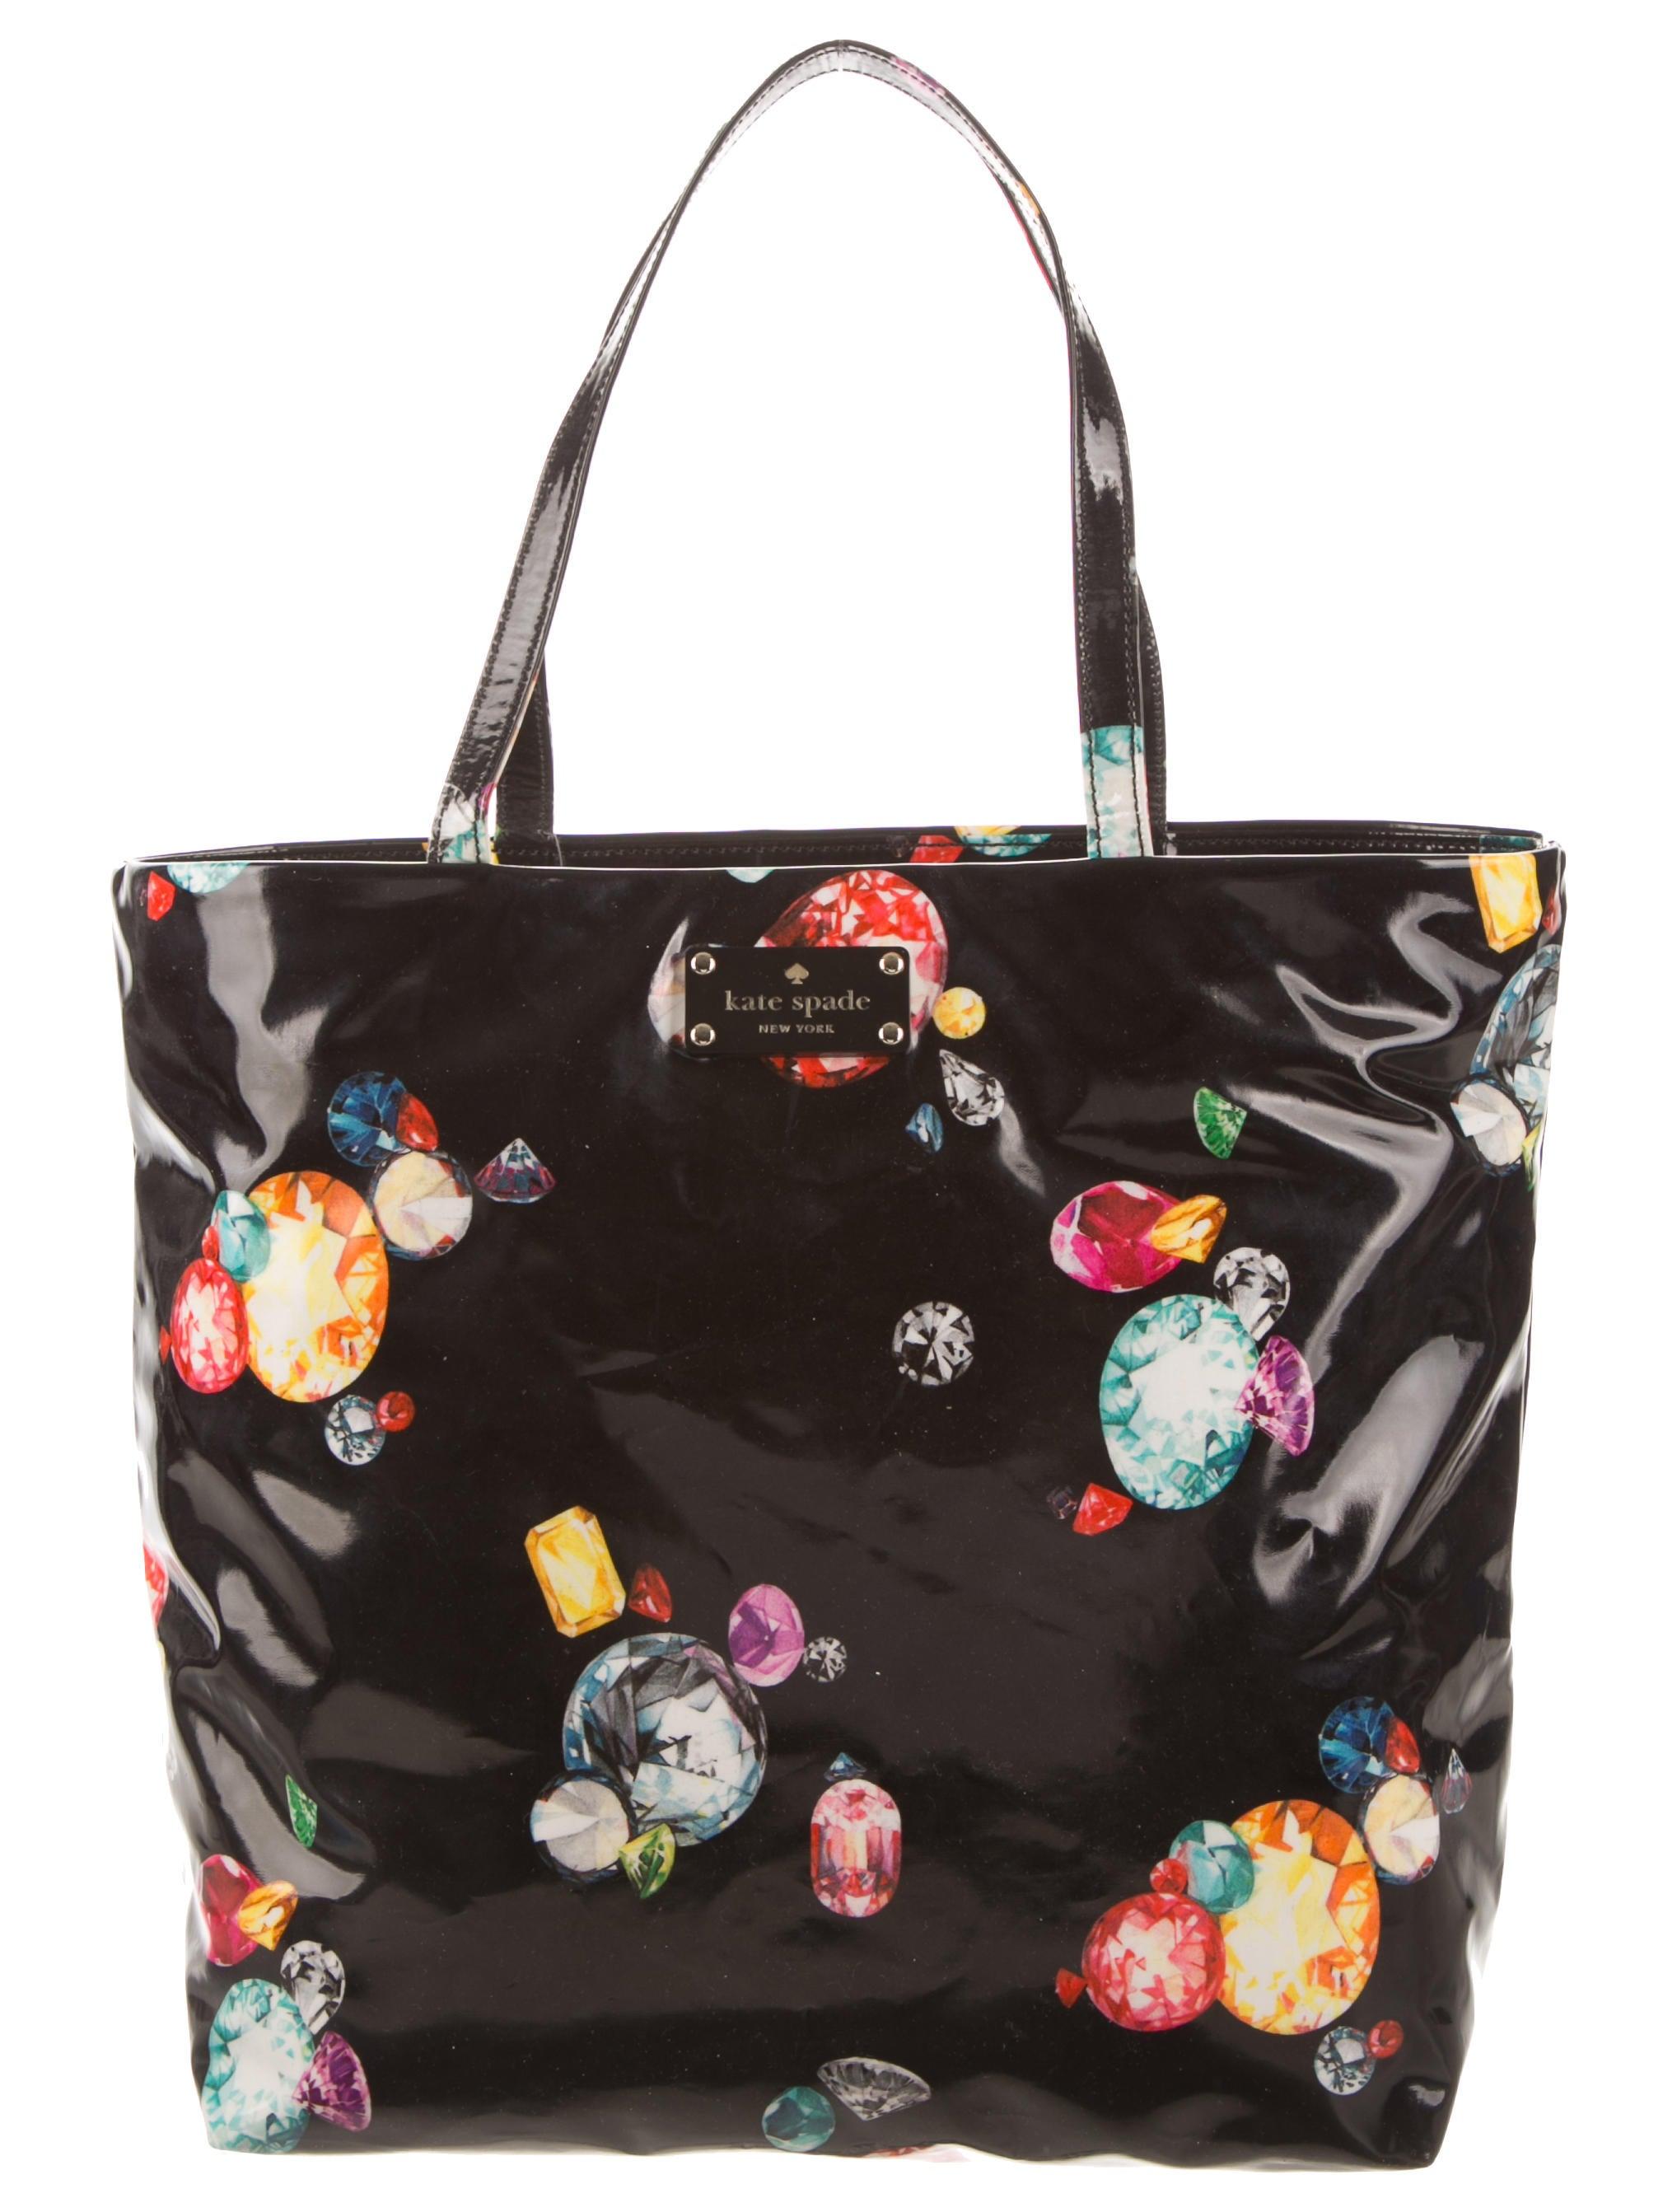 3bfdee009f23 Kate Spade New York Daycation Bon Shopper Tote Bag Kings Jewels w ...